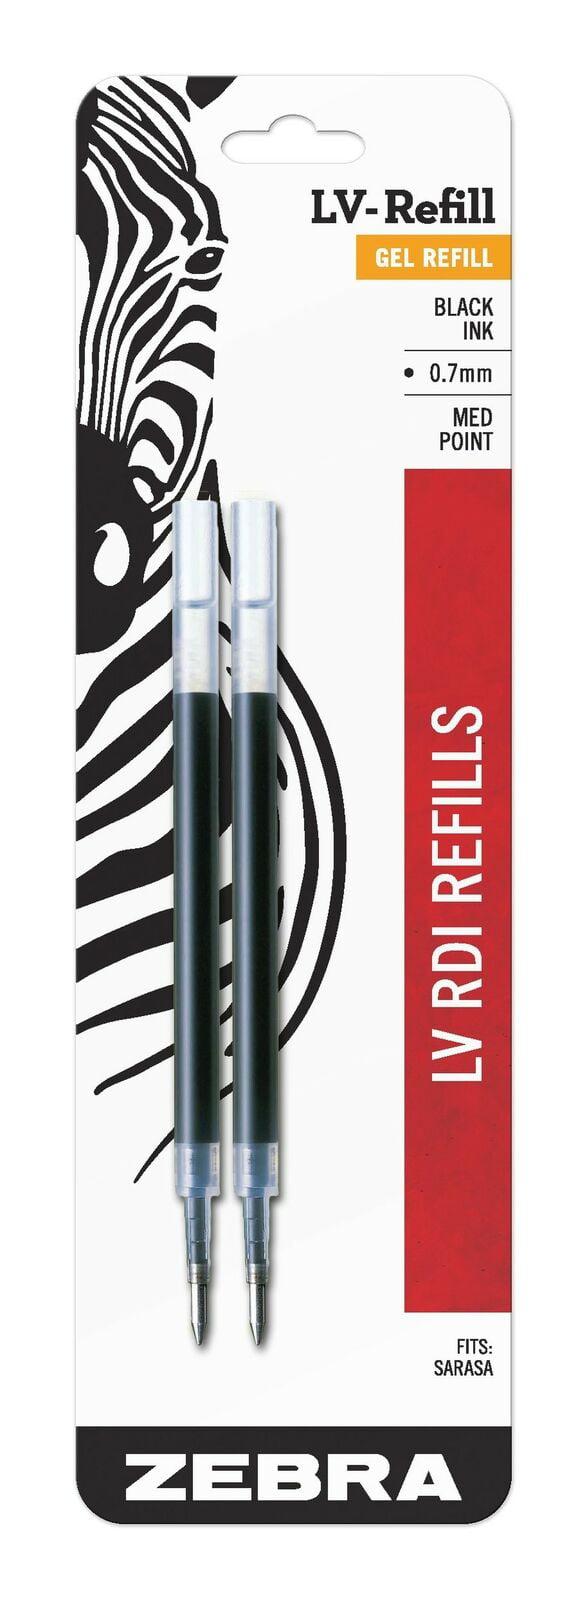 0.7mm Medium Point Black Ink 2-Count Zebra Sarasa RDI LV-Refill